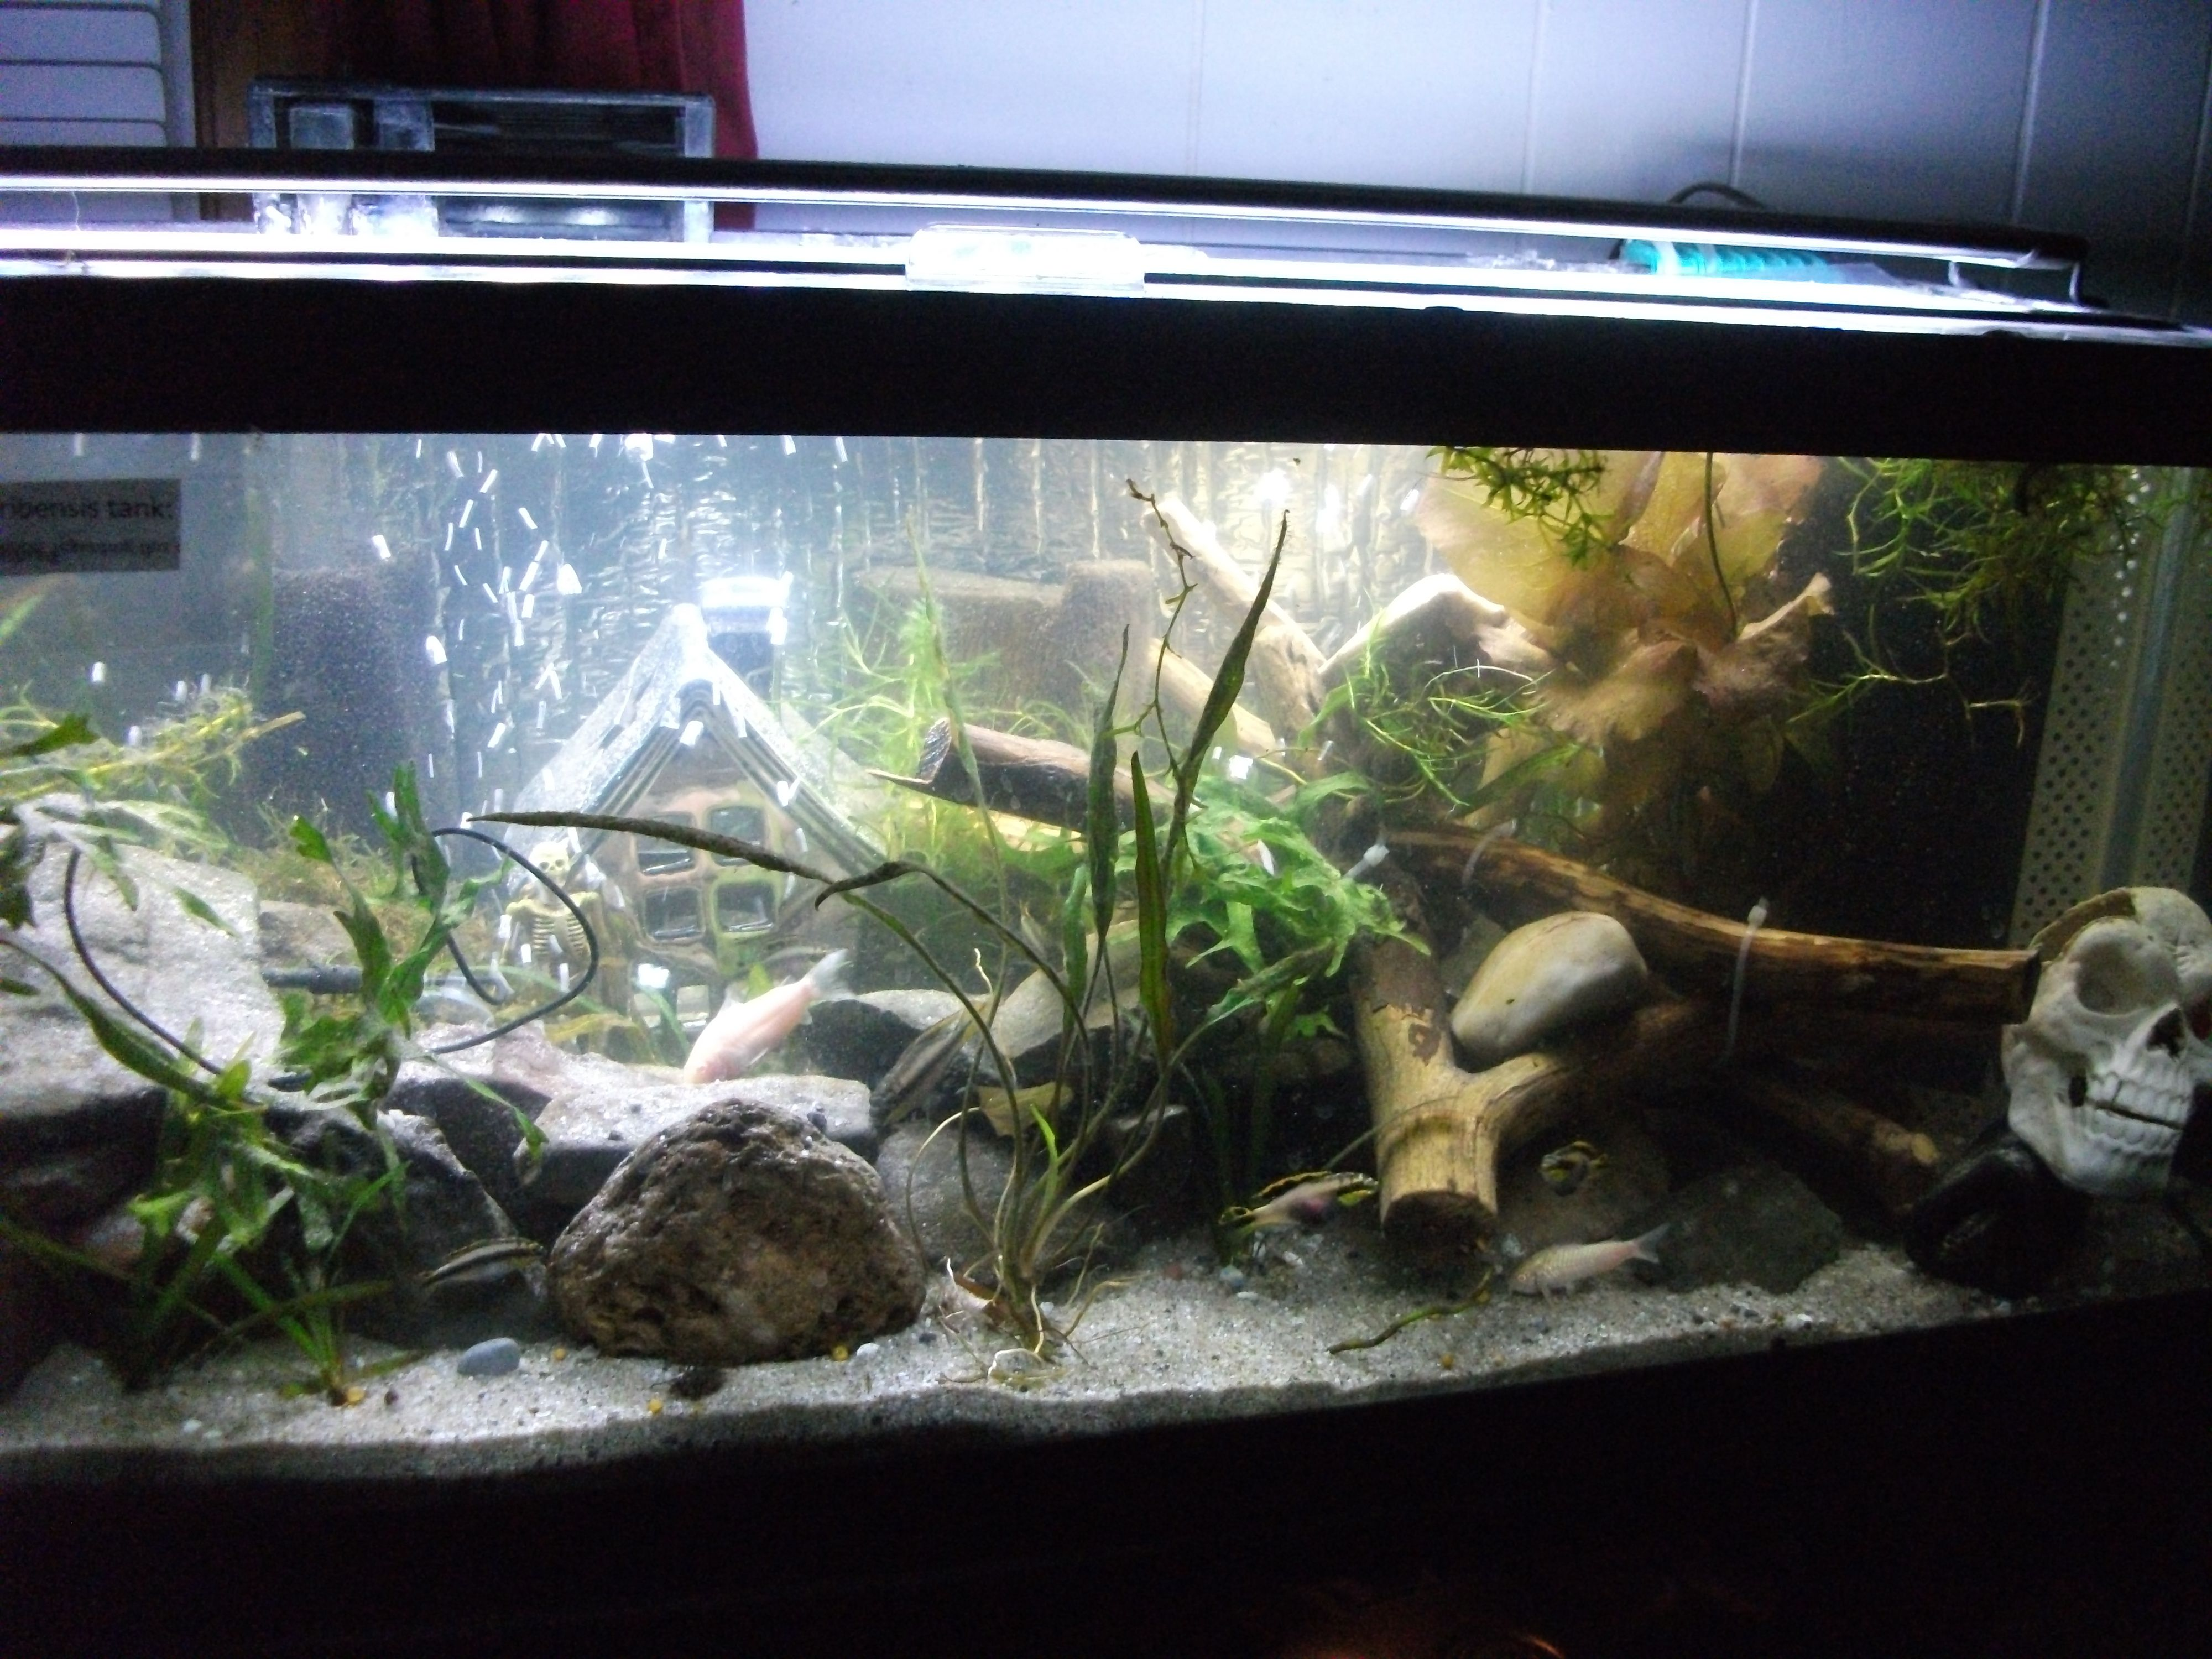 My 20 gallon long Kribensis tank with Matten corner filter and Kribs